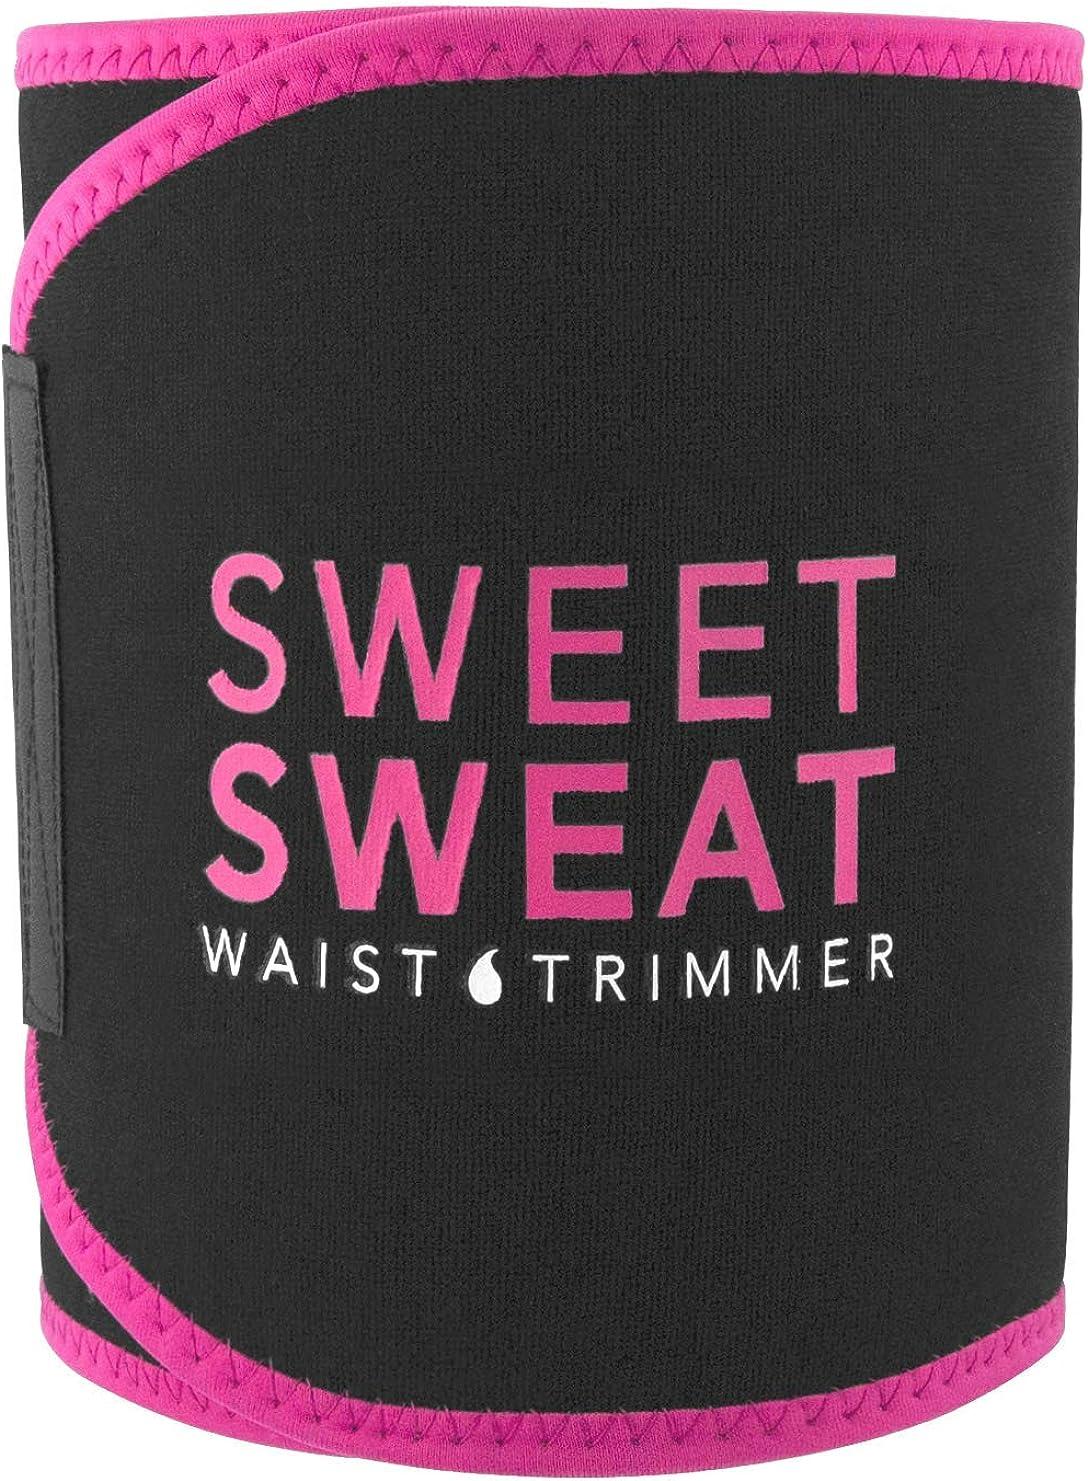 Sweet Sweat Waist Trimmer for Men & Women Black/Pink   Premium Waist Trainer Sauna Suit, Includes Sample of Sweet Sweat Gel!